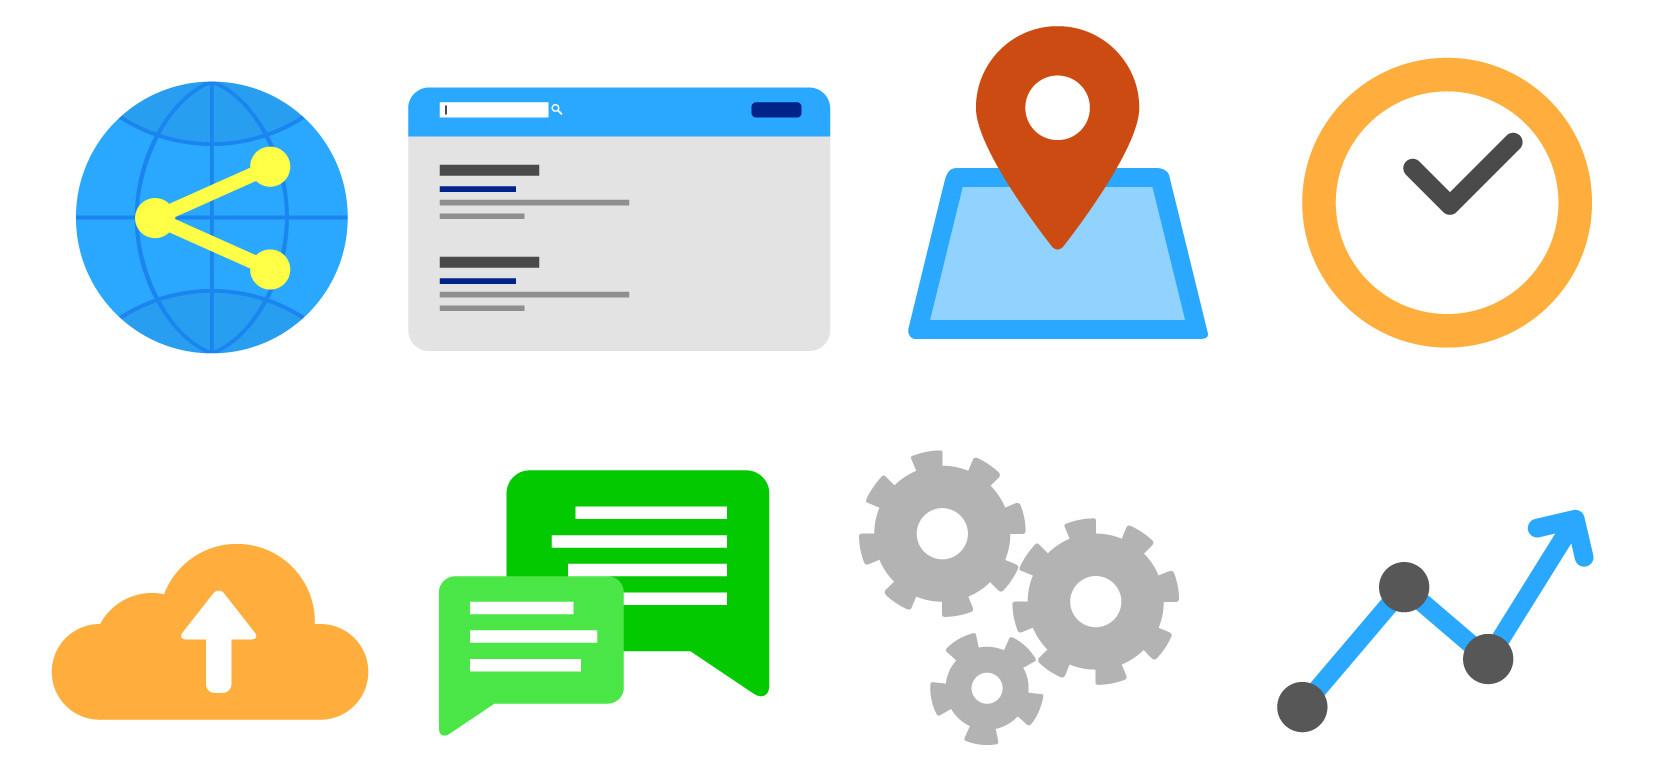 link relacionados - nofollow e link building